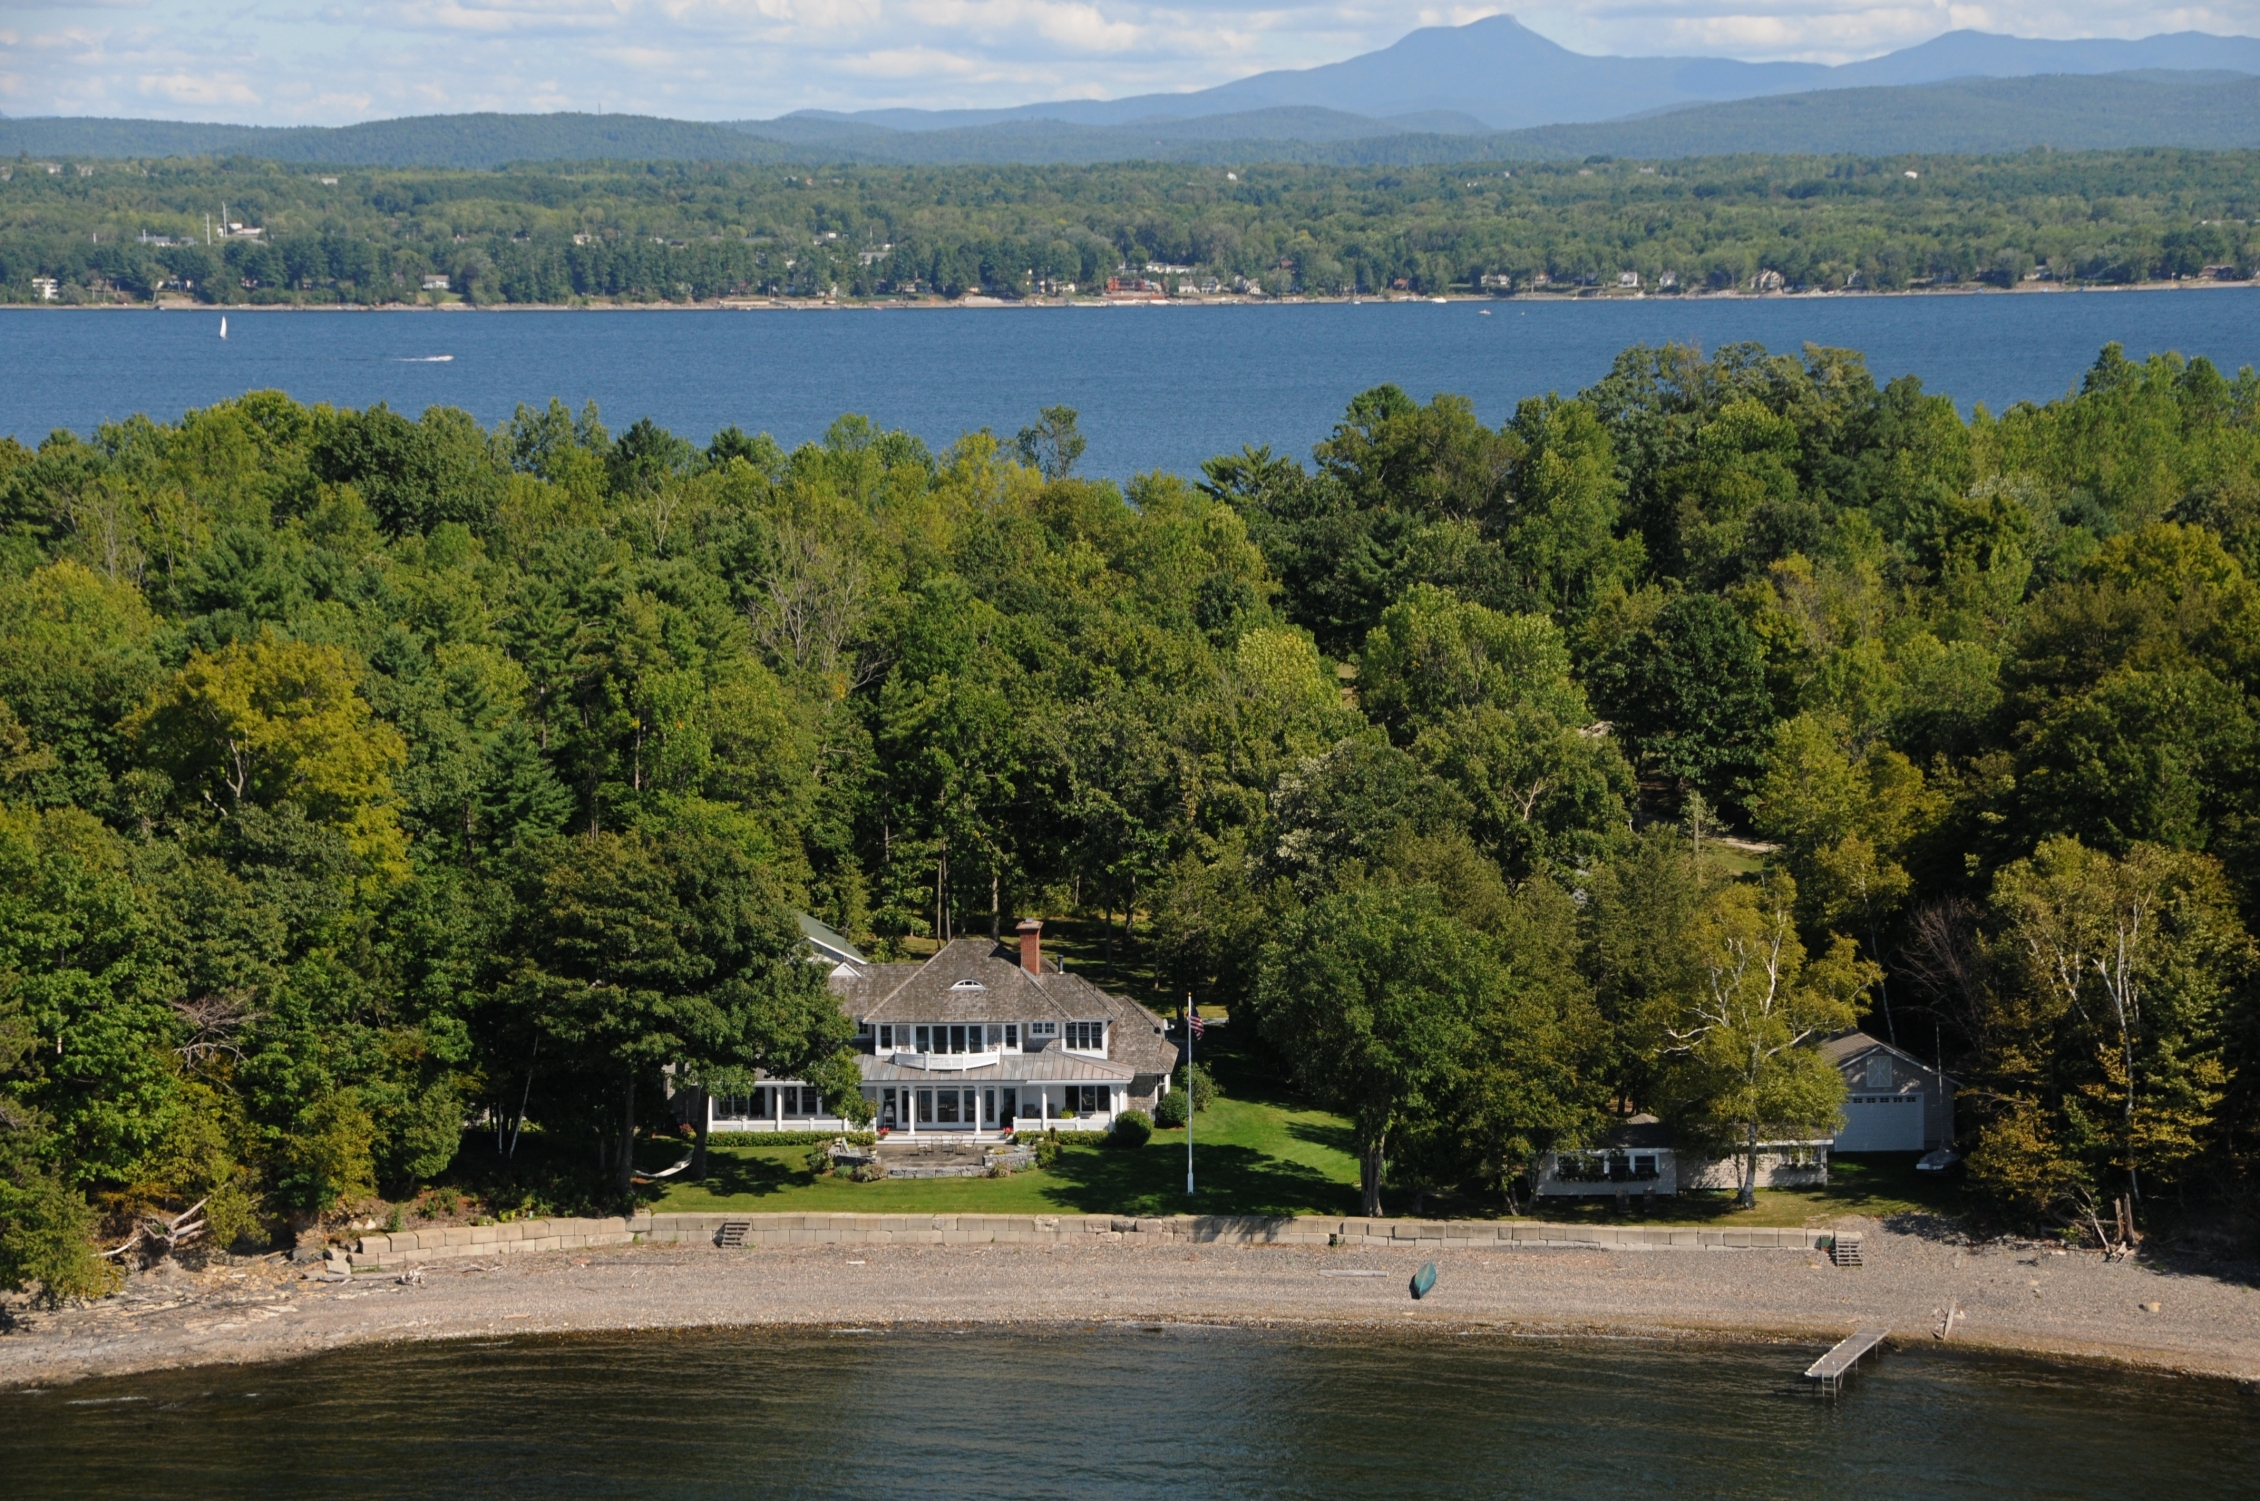 Single Family Home for Sale at 3689 Harbor Road, Shelburne 3689 Harbor Rd Shelburne, Vermont 05482 United States